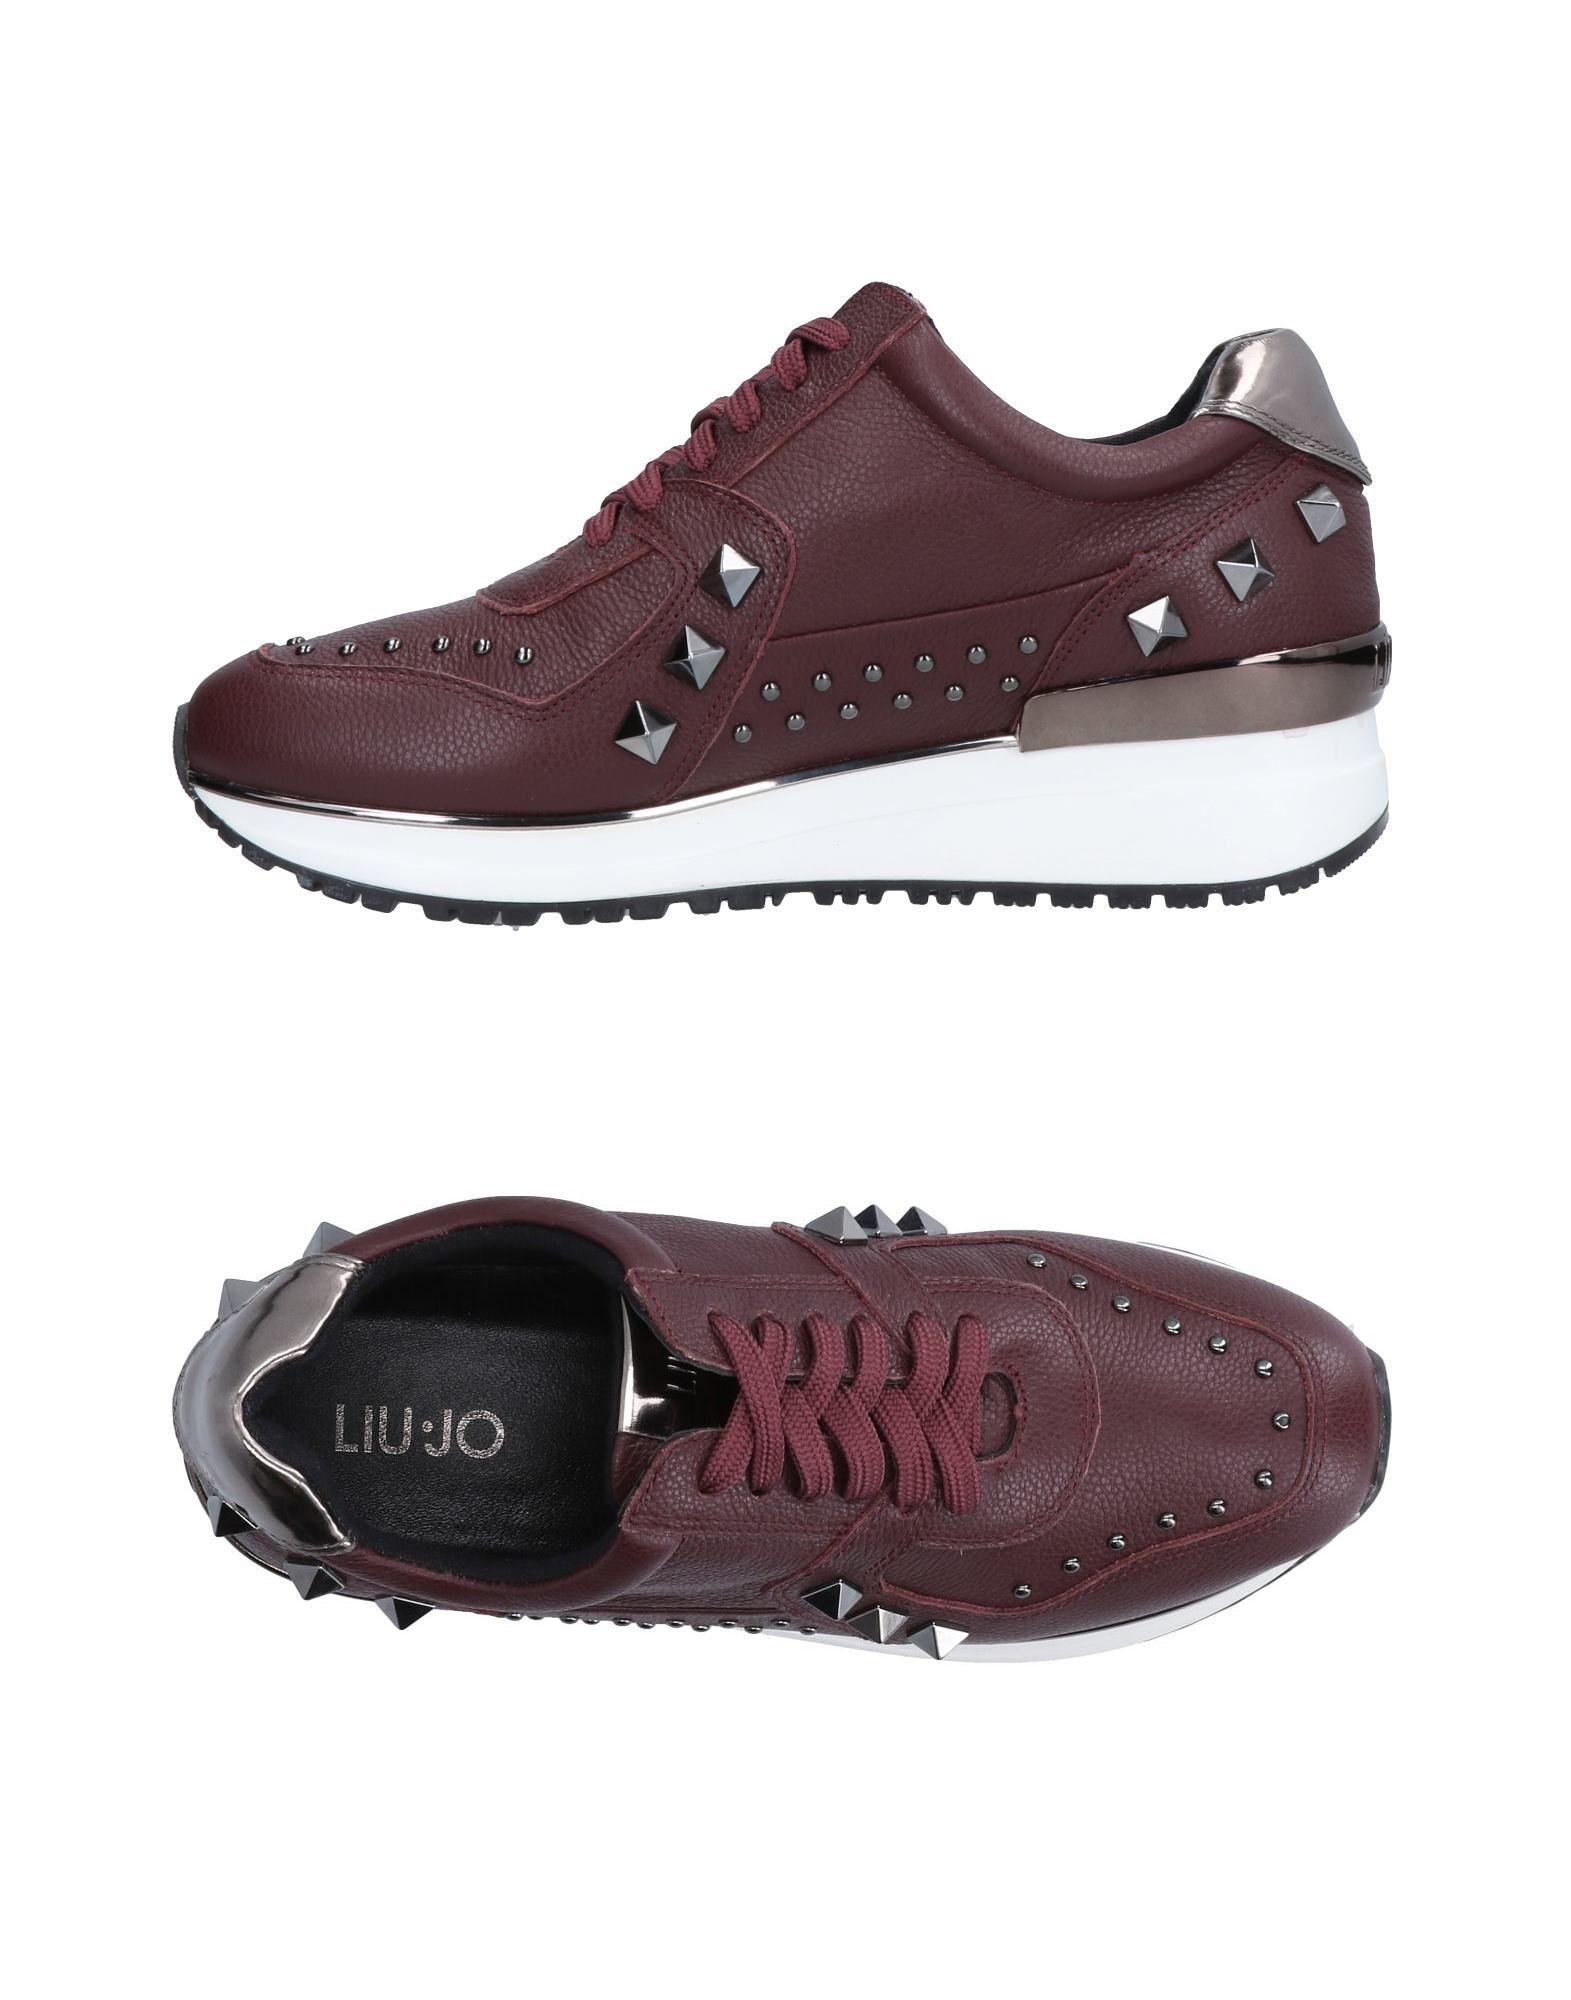 Liu •Jo Sneakers Damen Gutes Preis-Leistungs-Verhältnis, es lohnt sich 1298